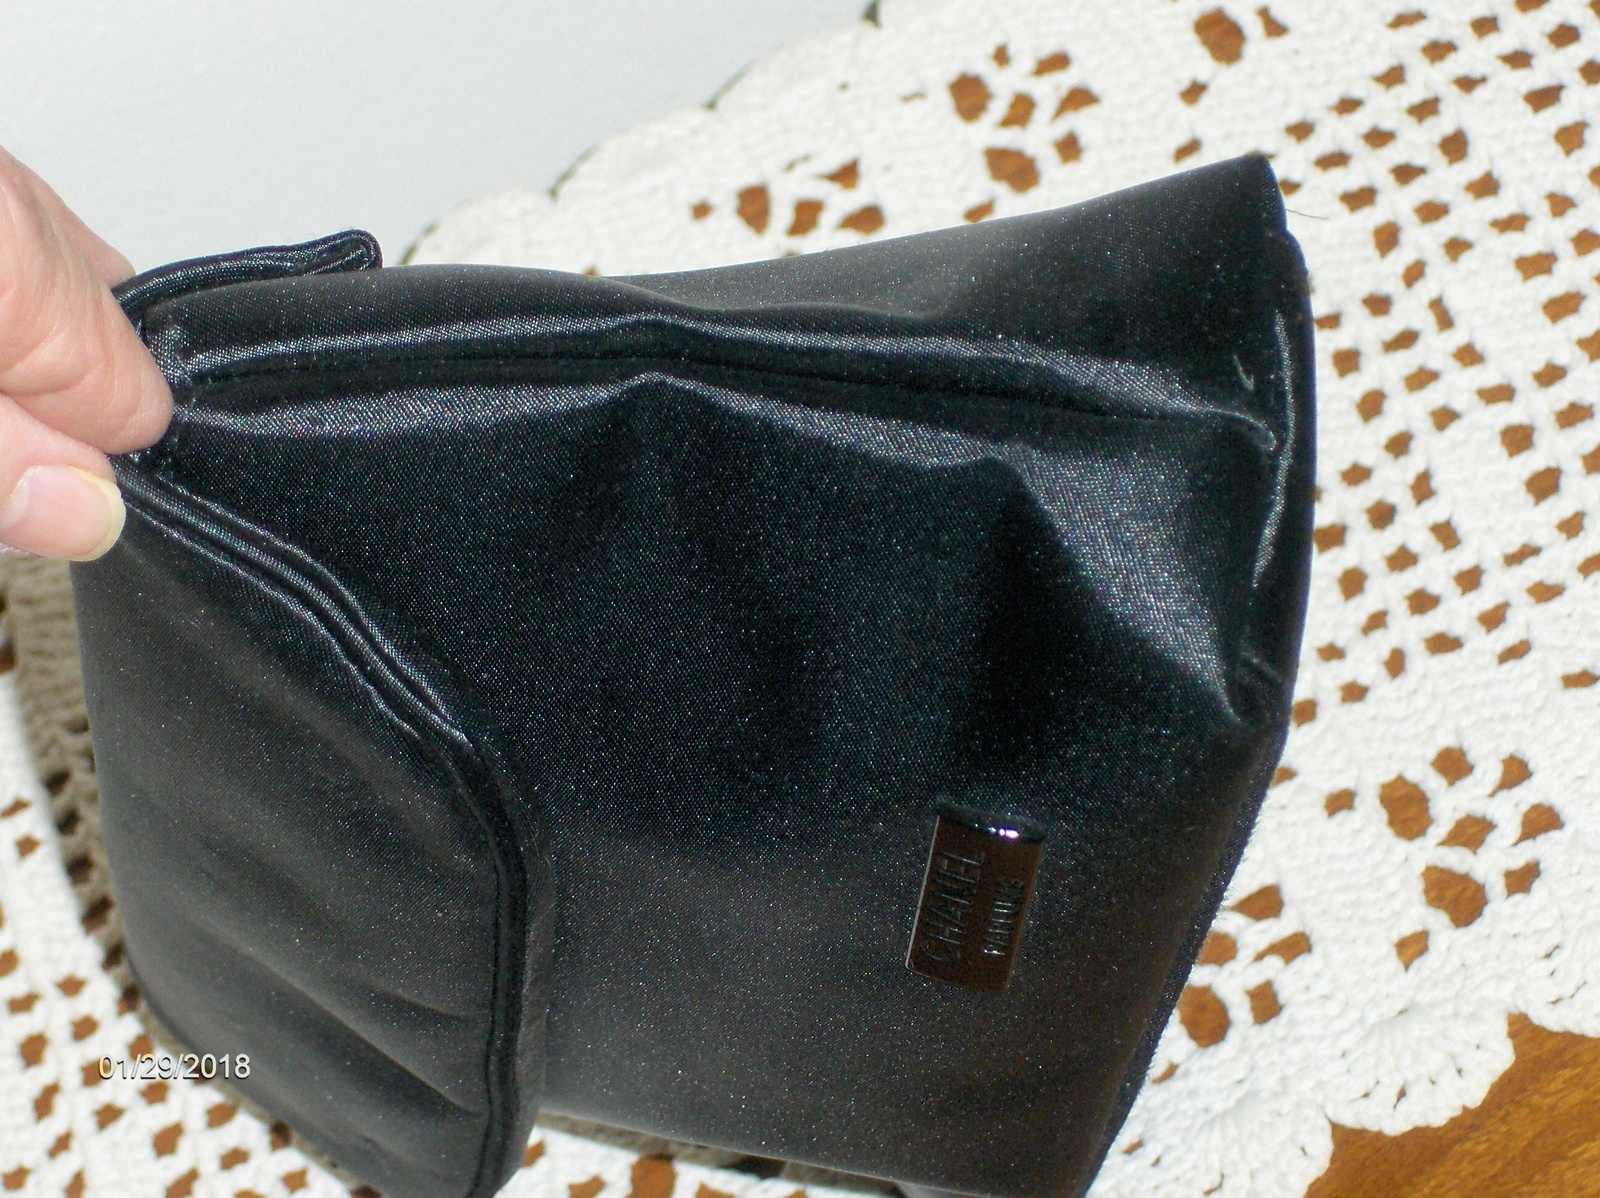 Chanel Parfums Cosmetic Makeup Bag Black Satin Clutch Purse Travel Case